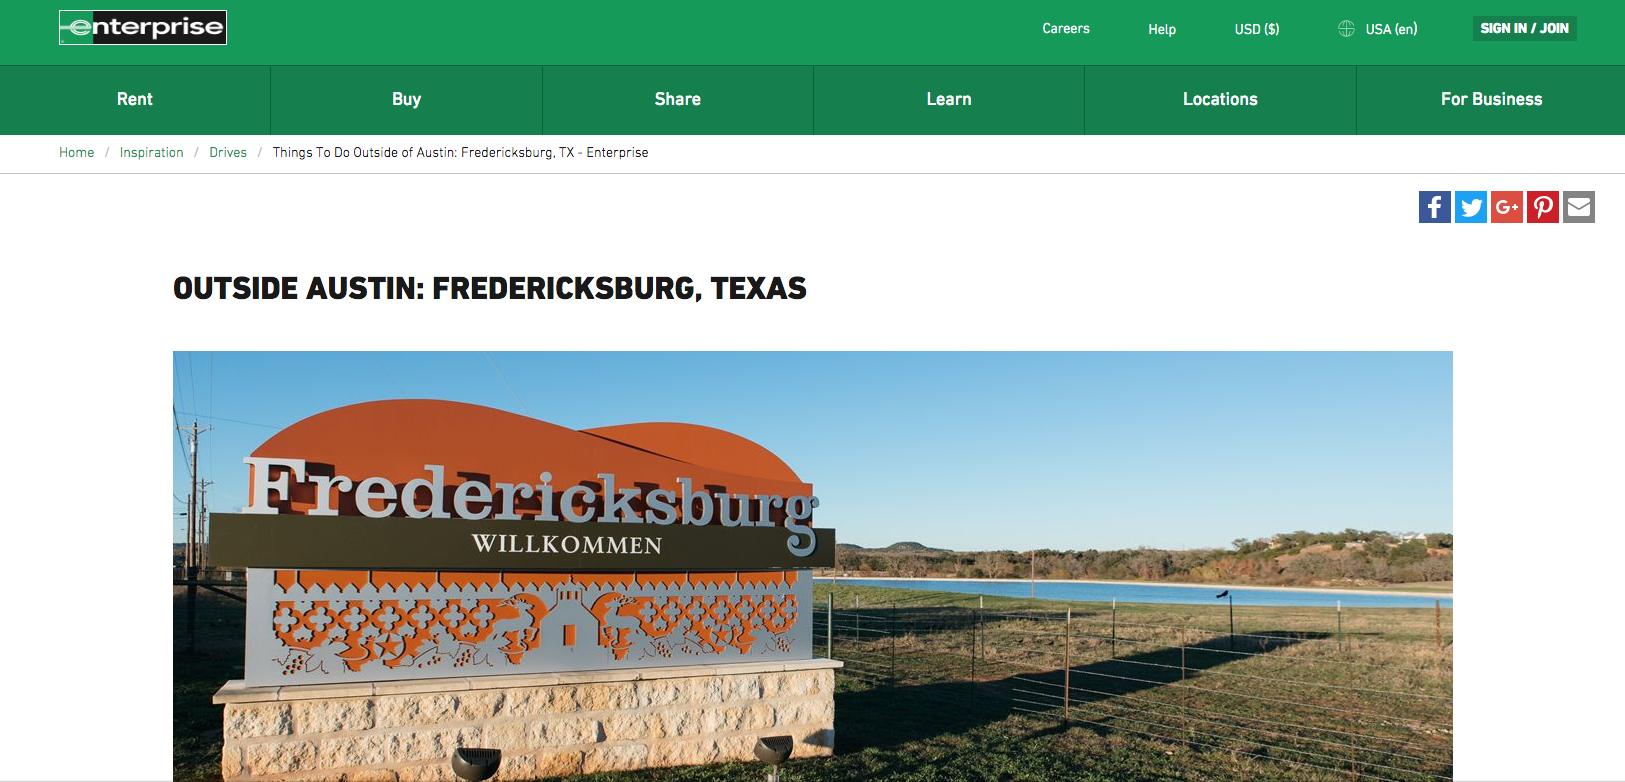 Enterprise Rental Cars - Online - Photos and day trip report on Fredricksburg, TX